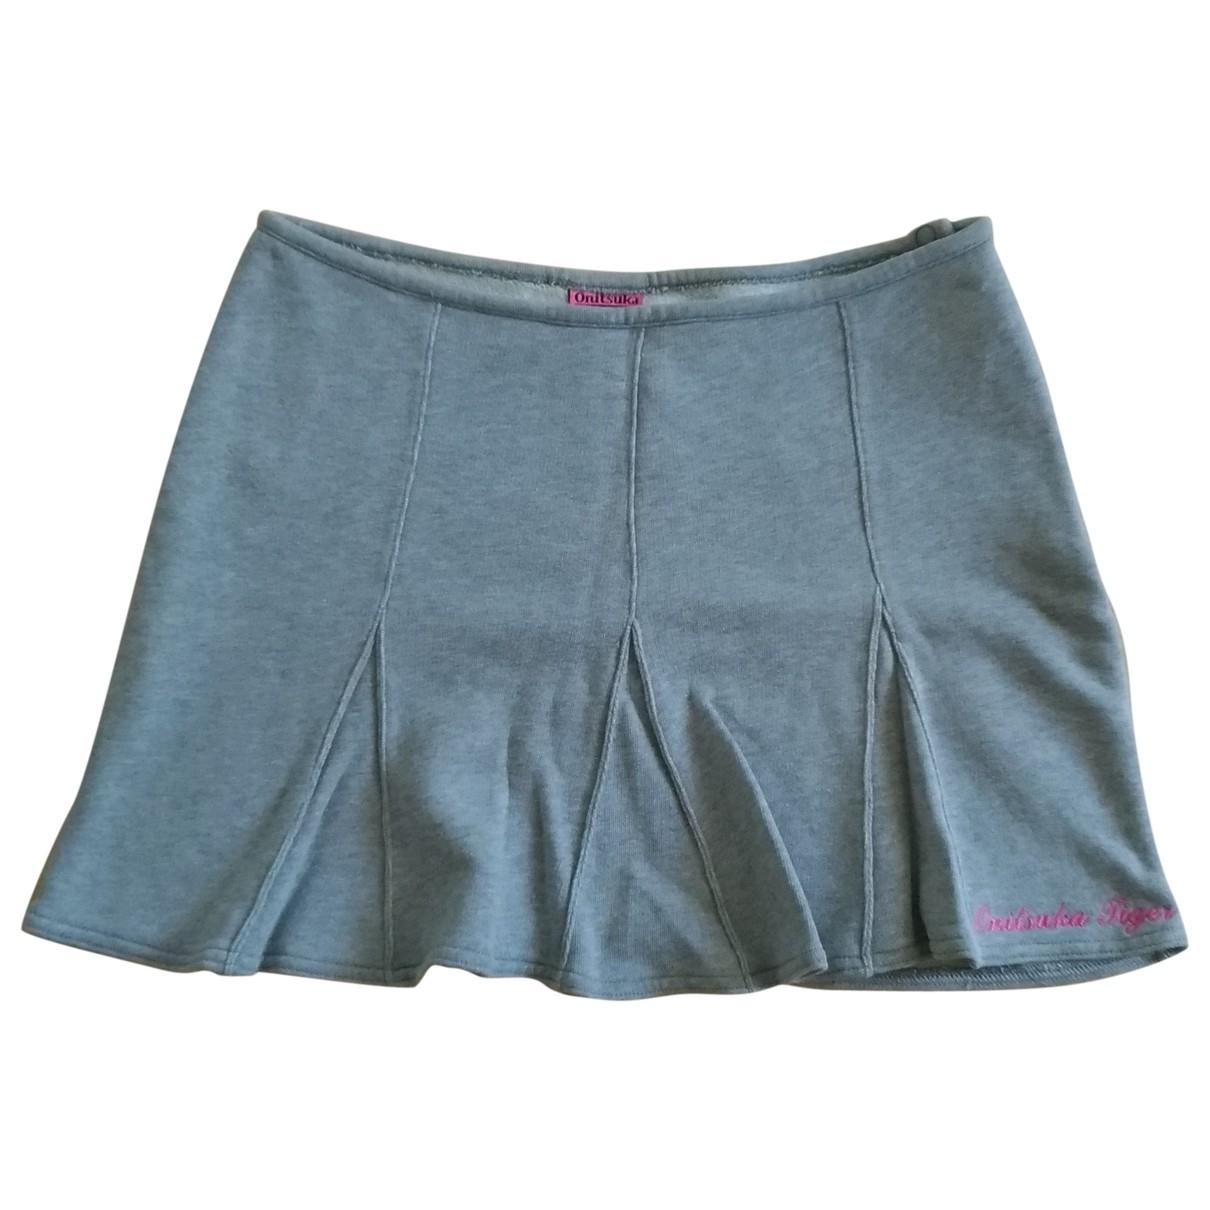 Onitsuka Tiger \N Grey Cotton skirt for Women S International